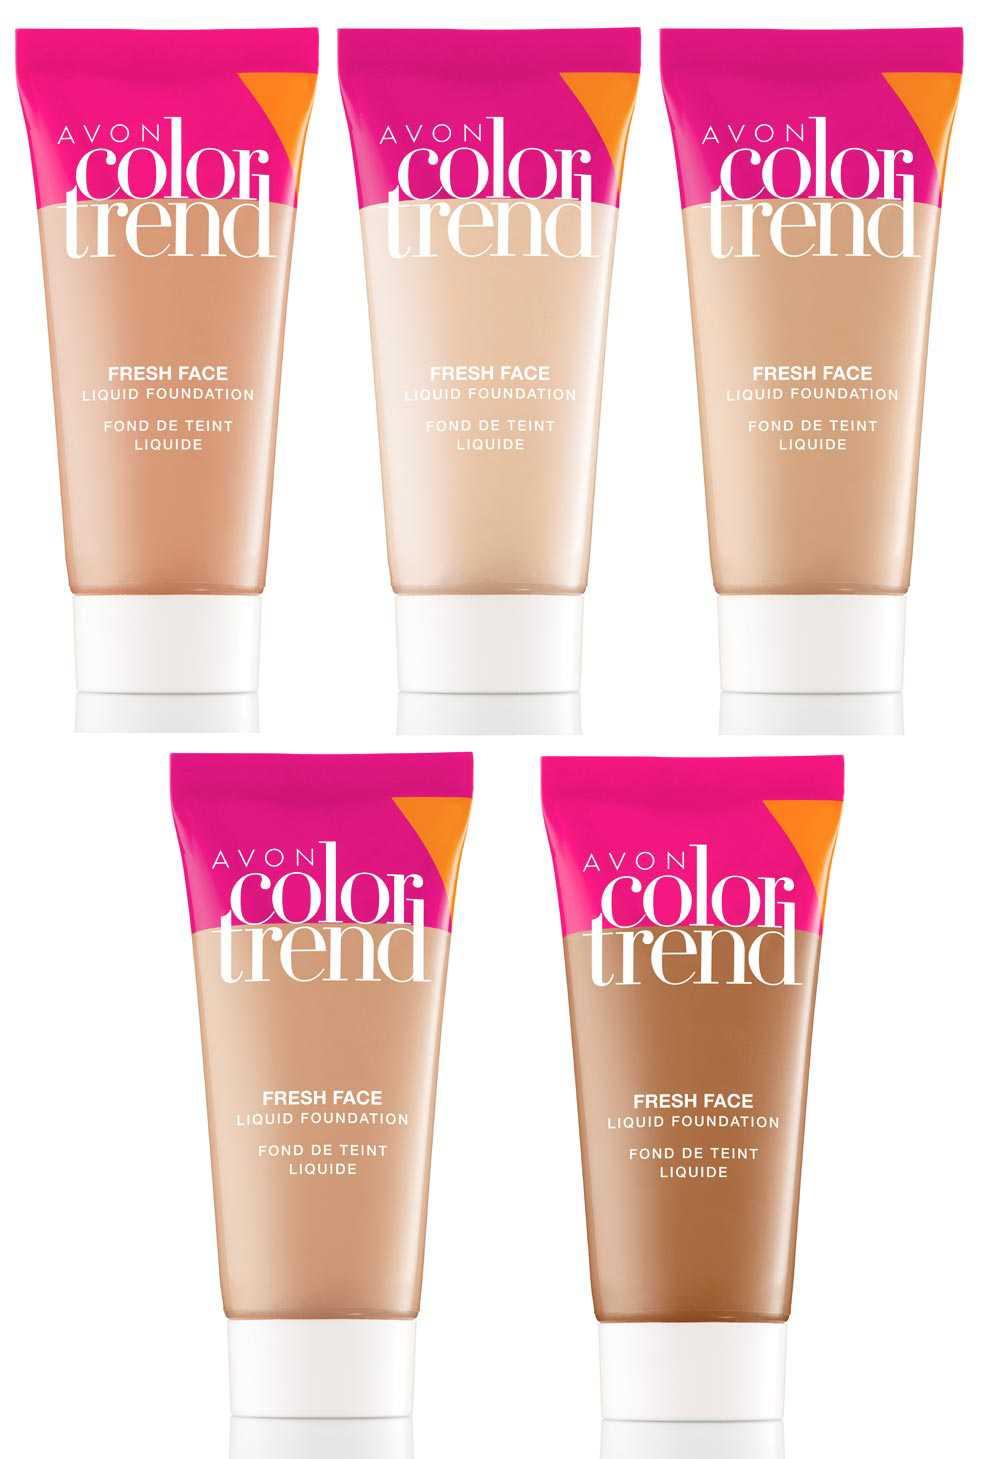 Beauty Cream Ad Fresh Face